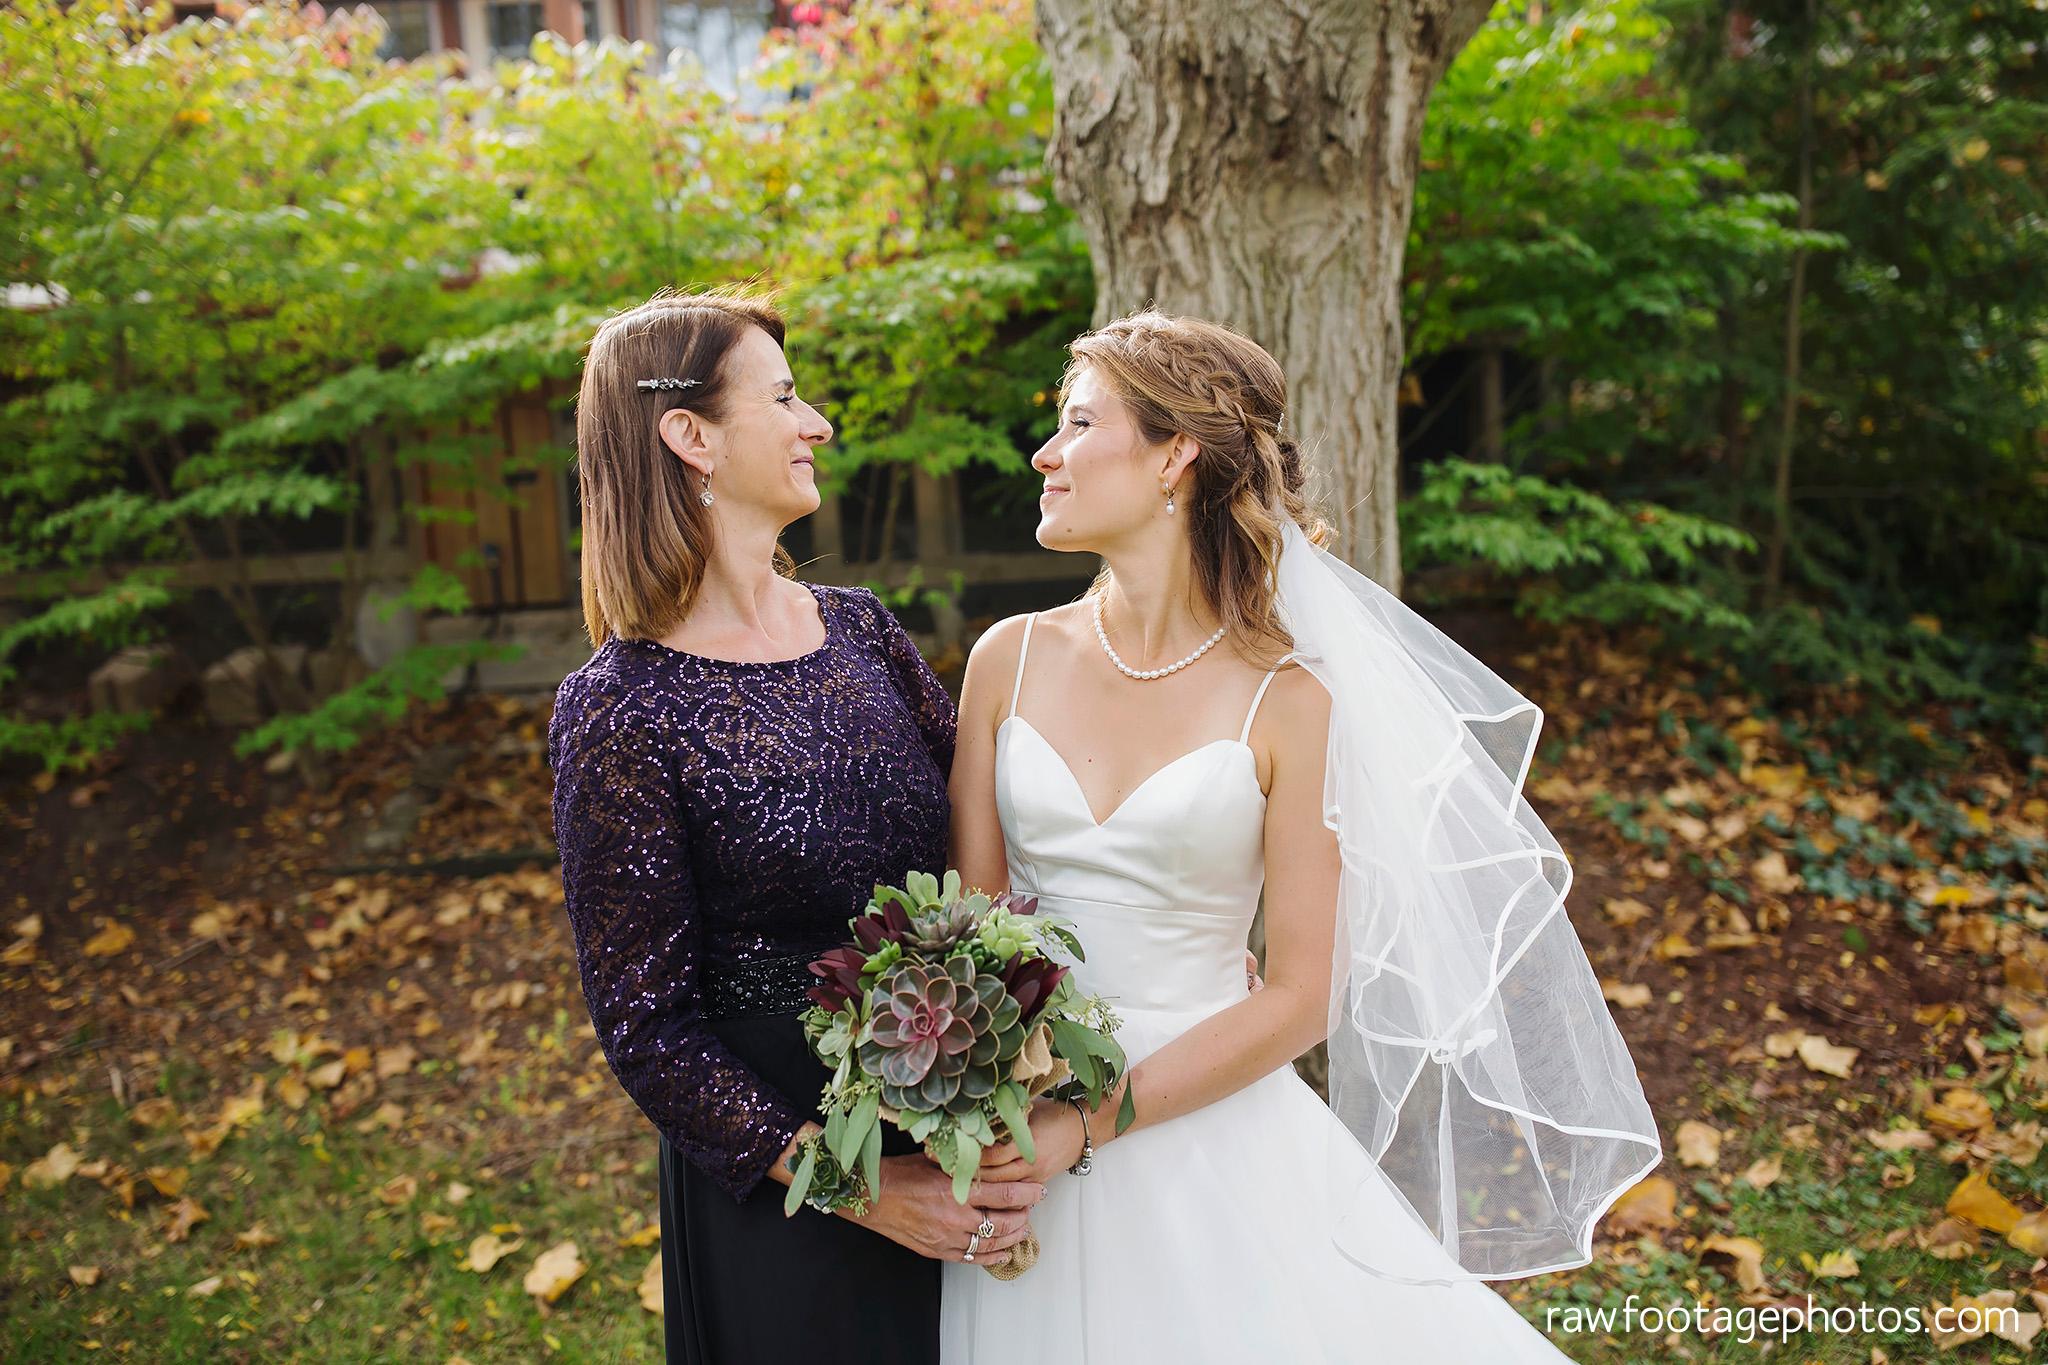 london_ontario_wedding_photographer-civic_gardens-springbank_park-succulent_bouquet-fall_wedding-bridge-raw_footage_photography018.jpg